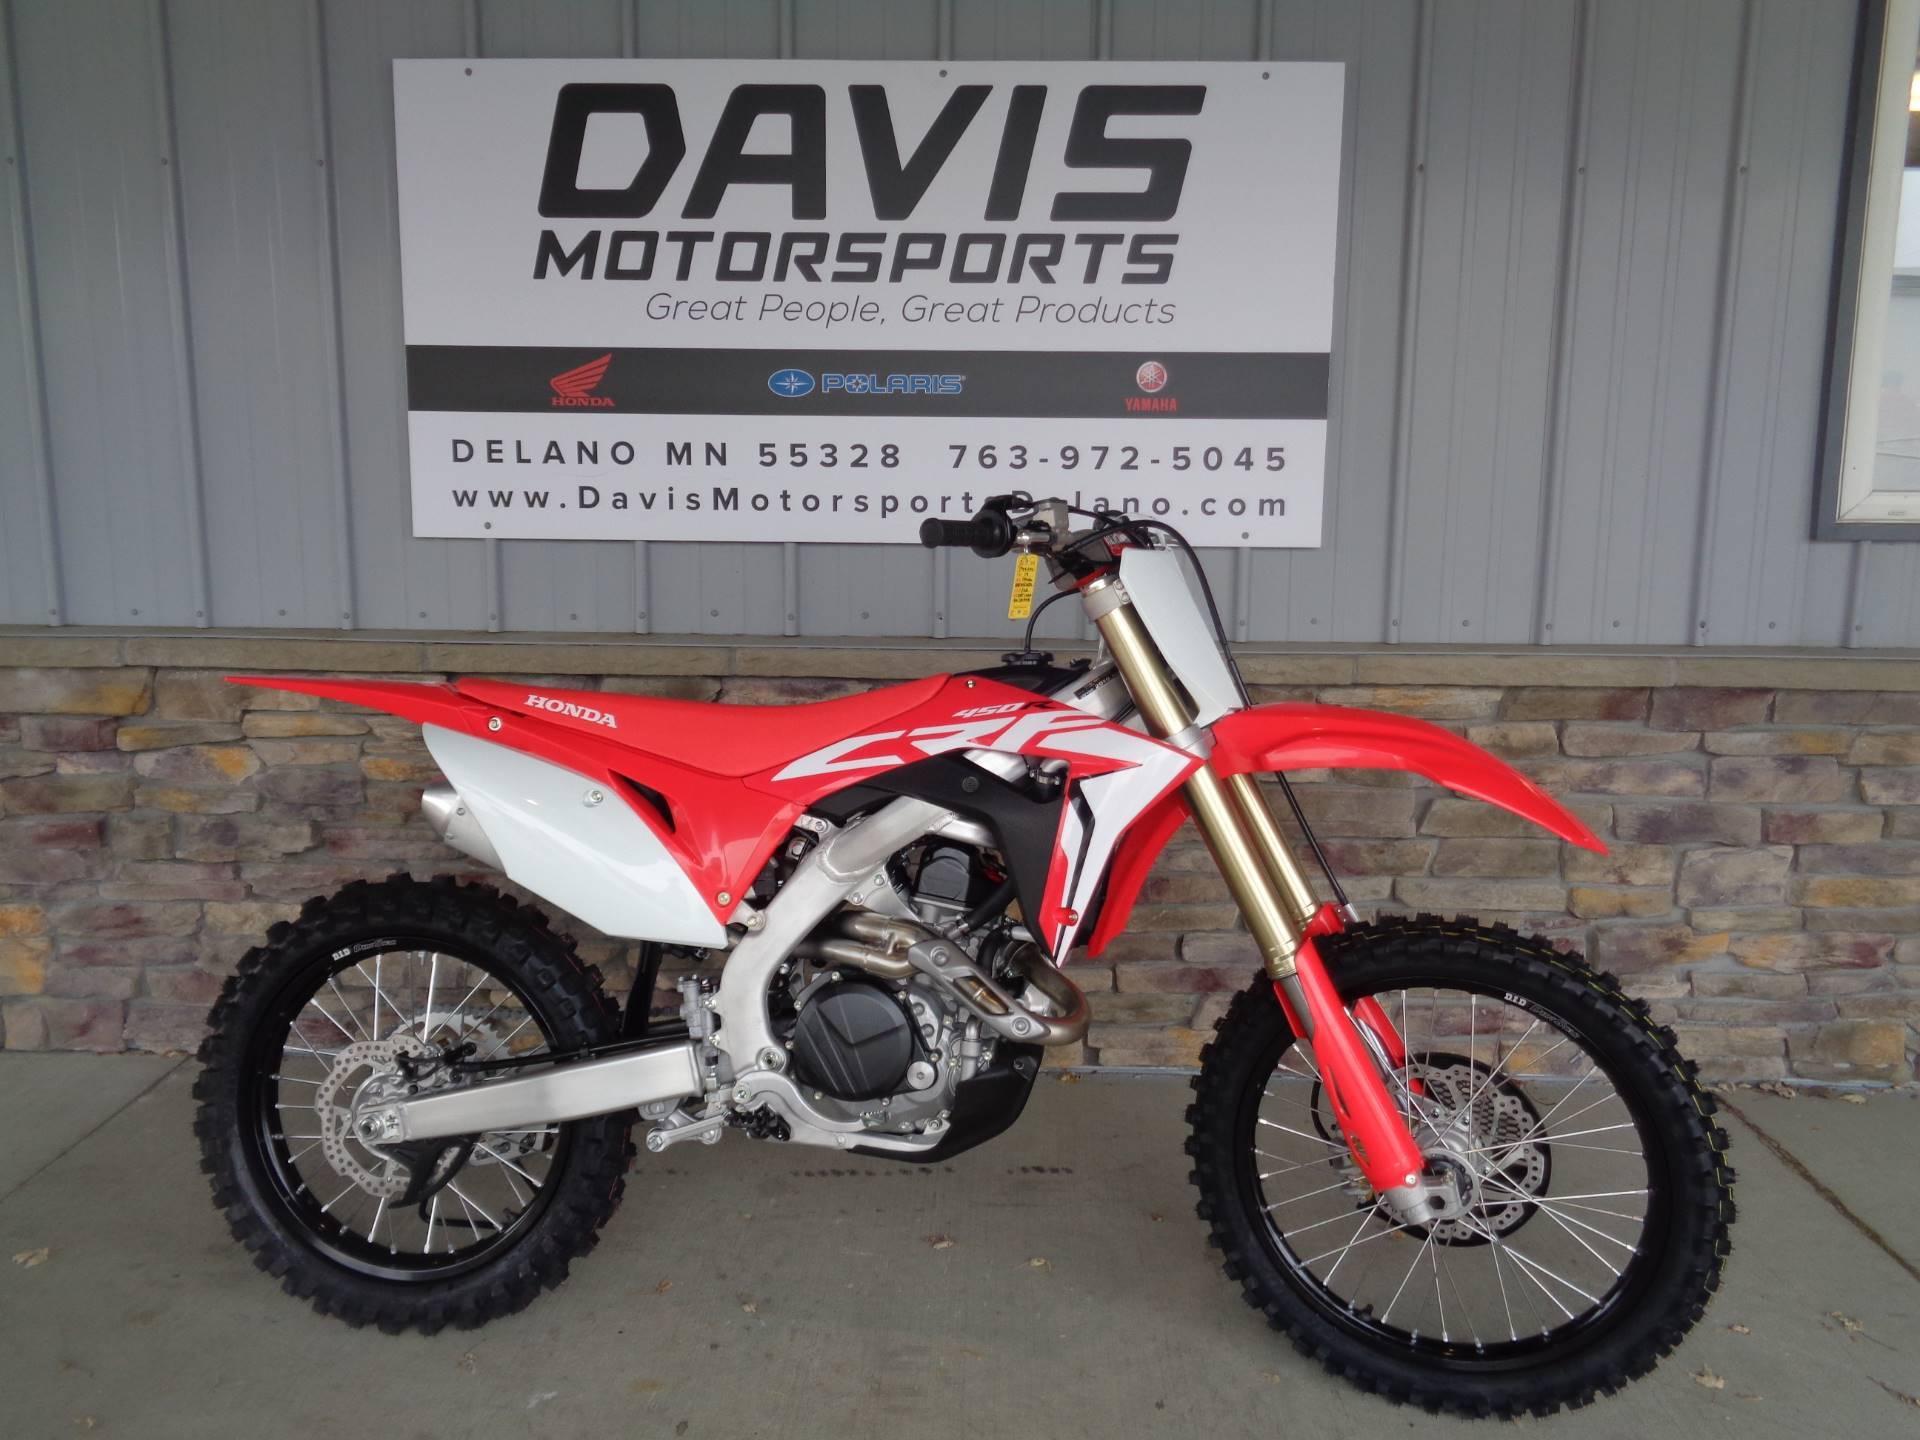 New 2019 Honda Crf450r Motorcycles In Delano Mn Na Red